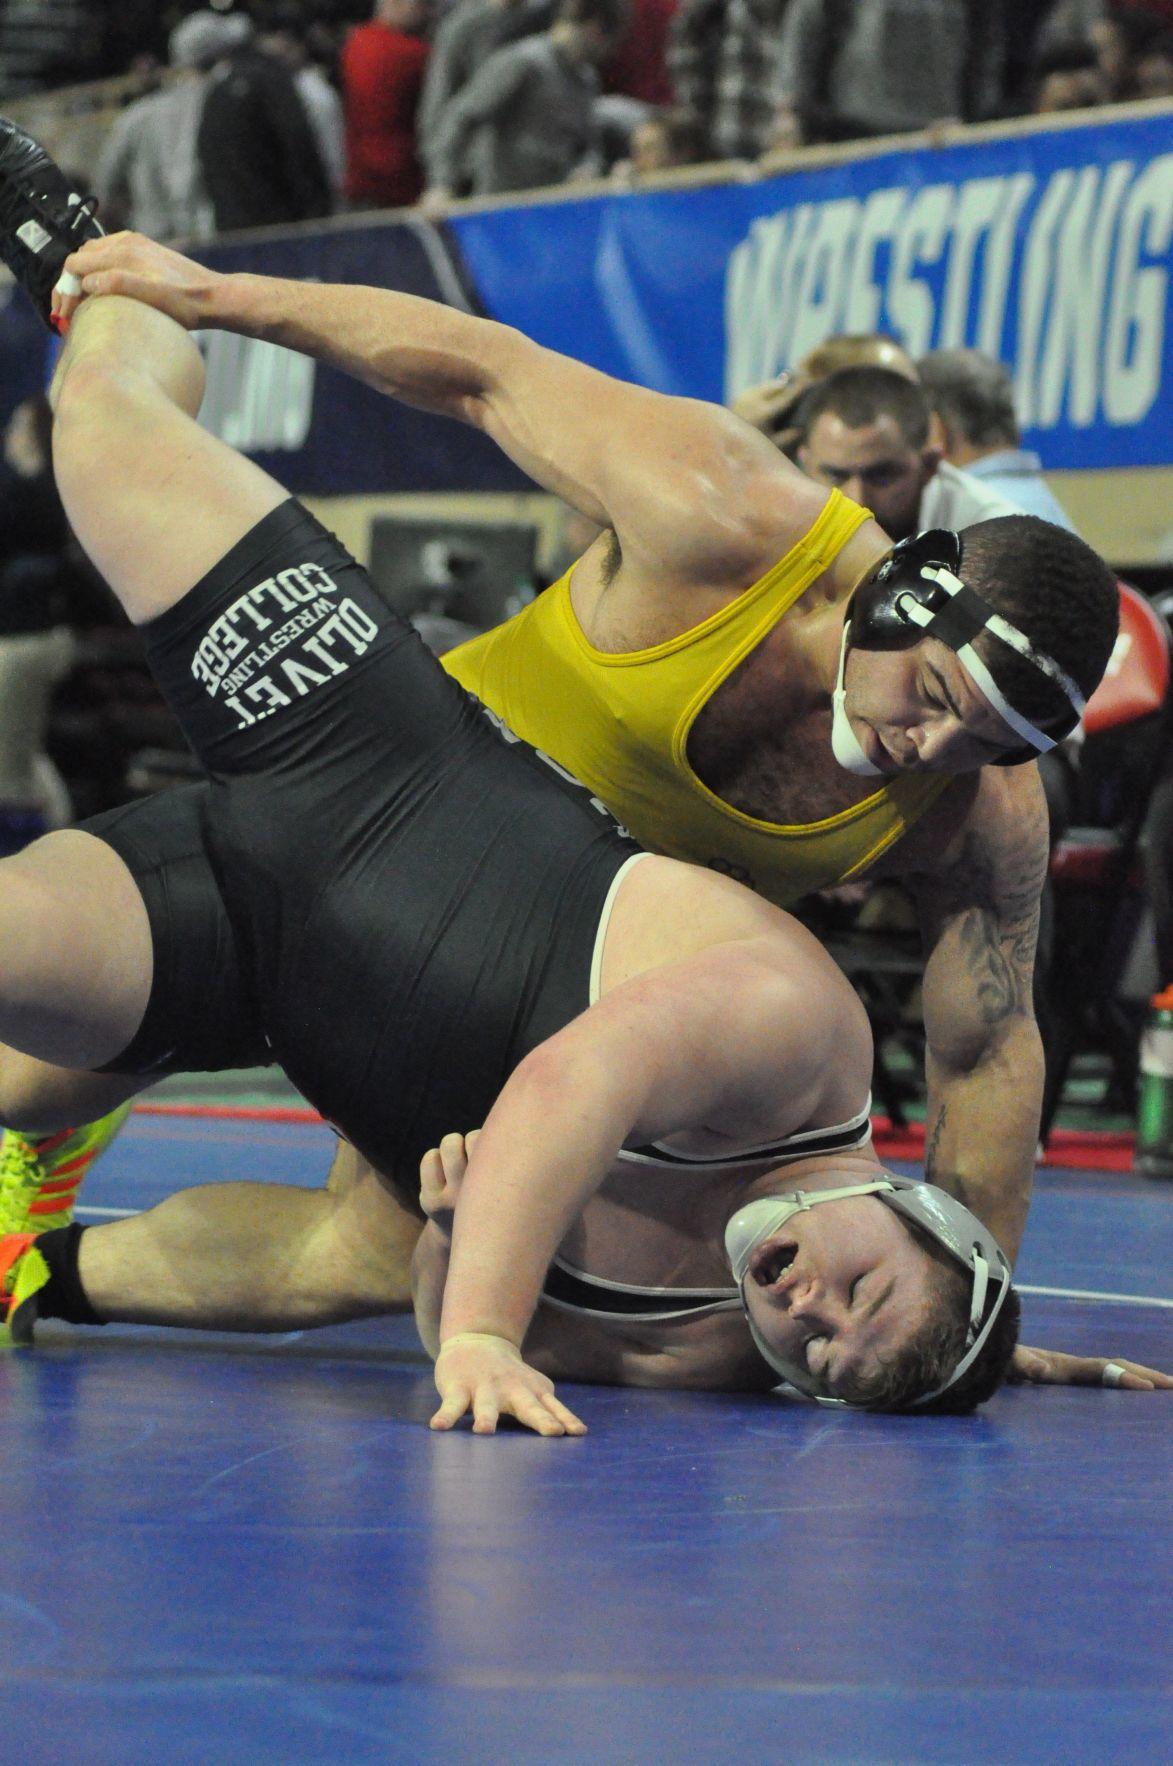 Adarios Jones at D-3 wrestling nationals